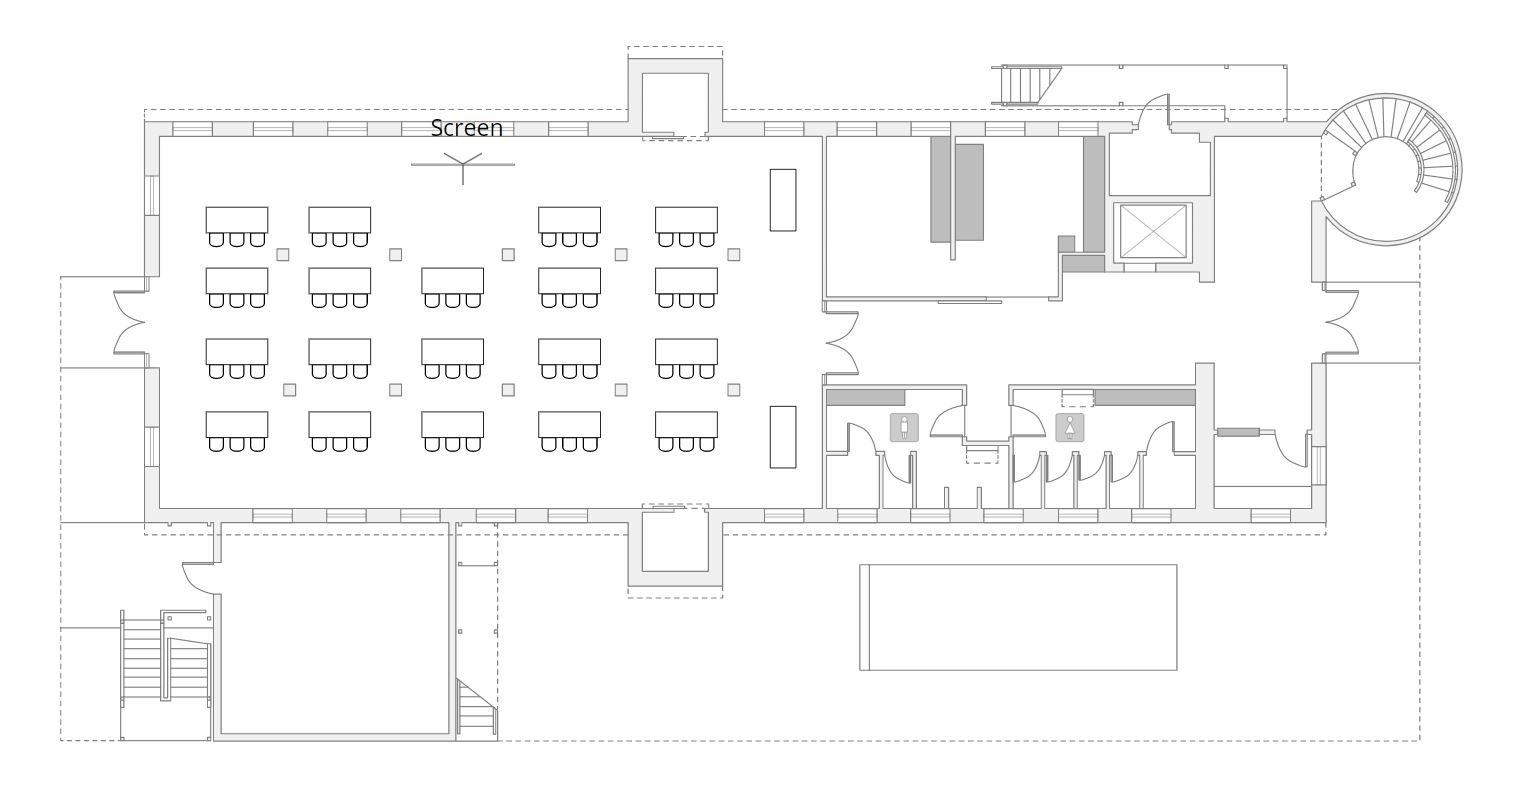 5 - Lower Level Classroom